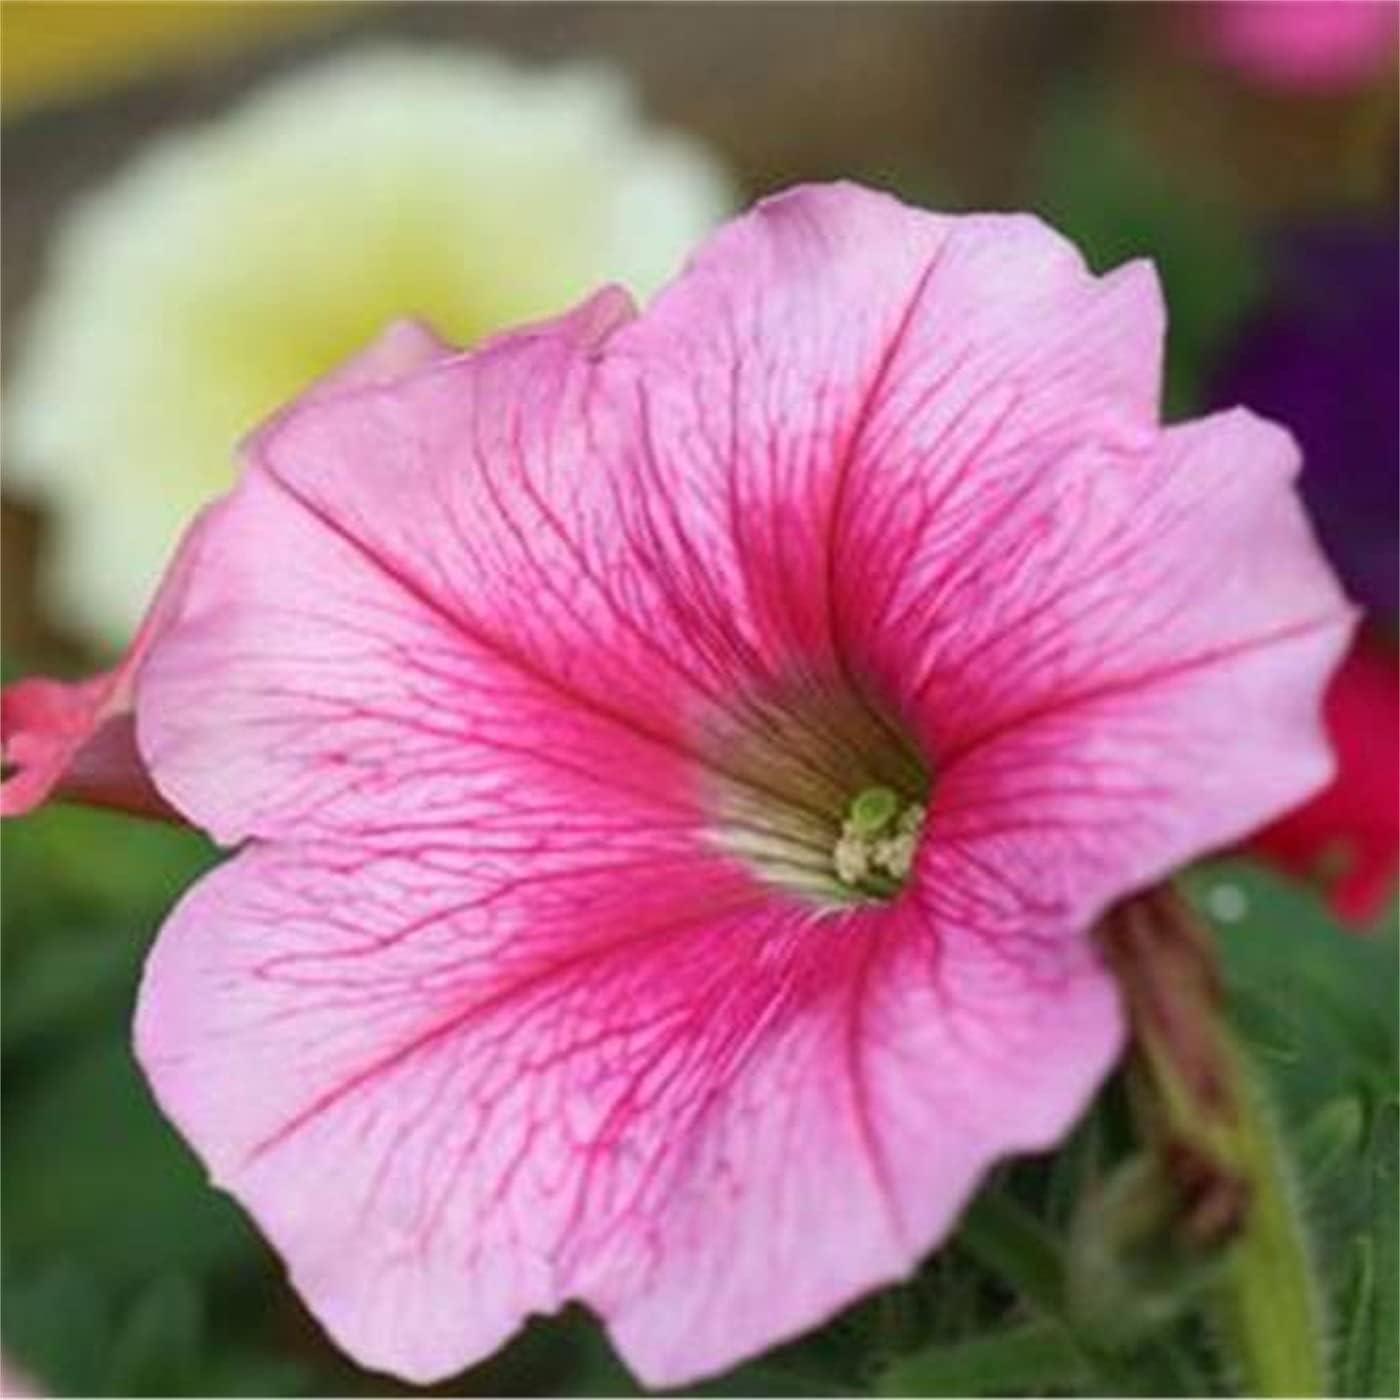 Mix Petunia Superlatite Seeds-Home DIY New mail order Decoration Color G Flower Secret Rare